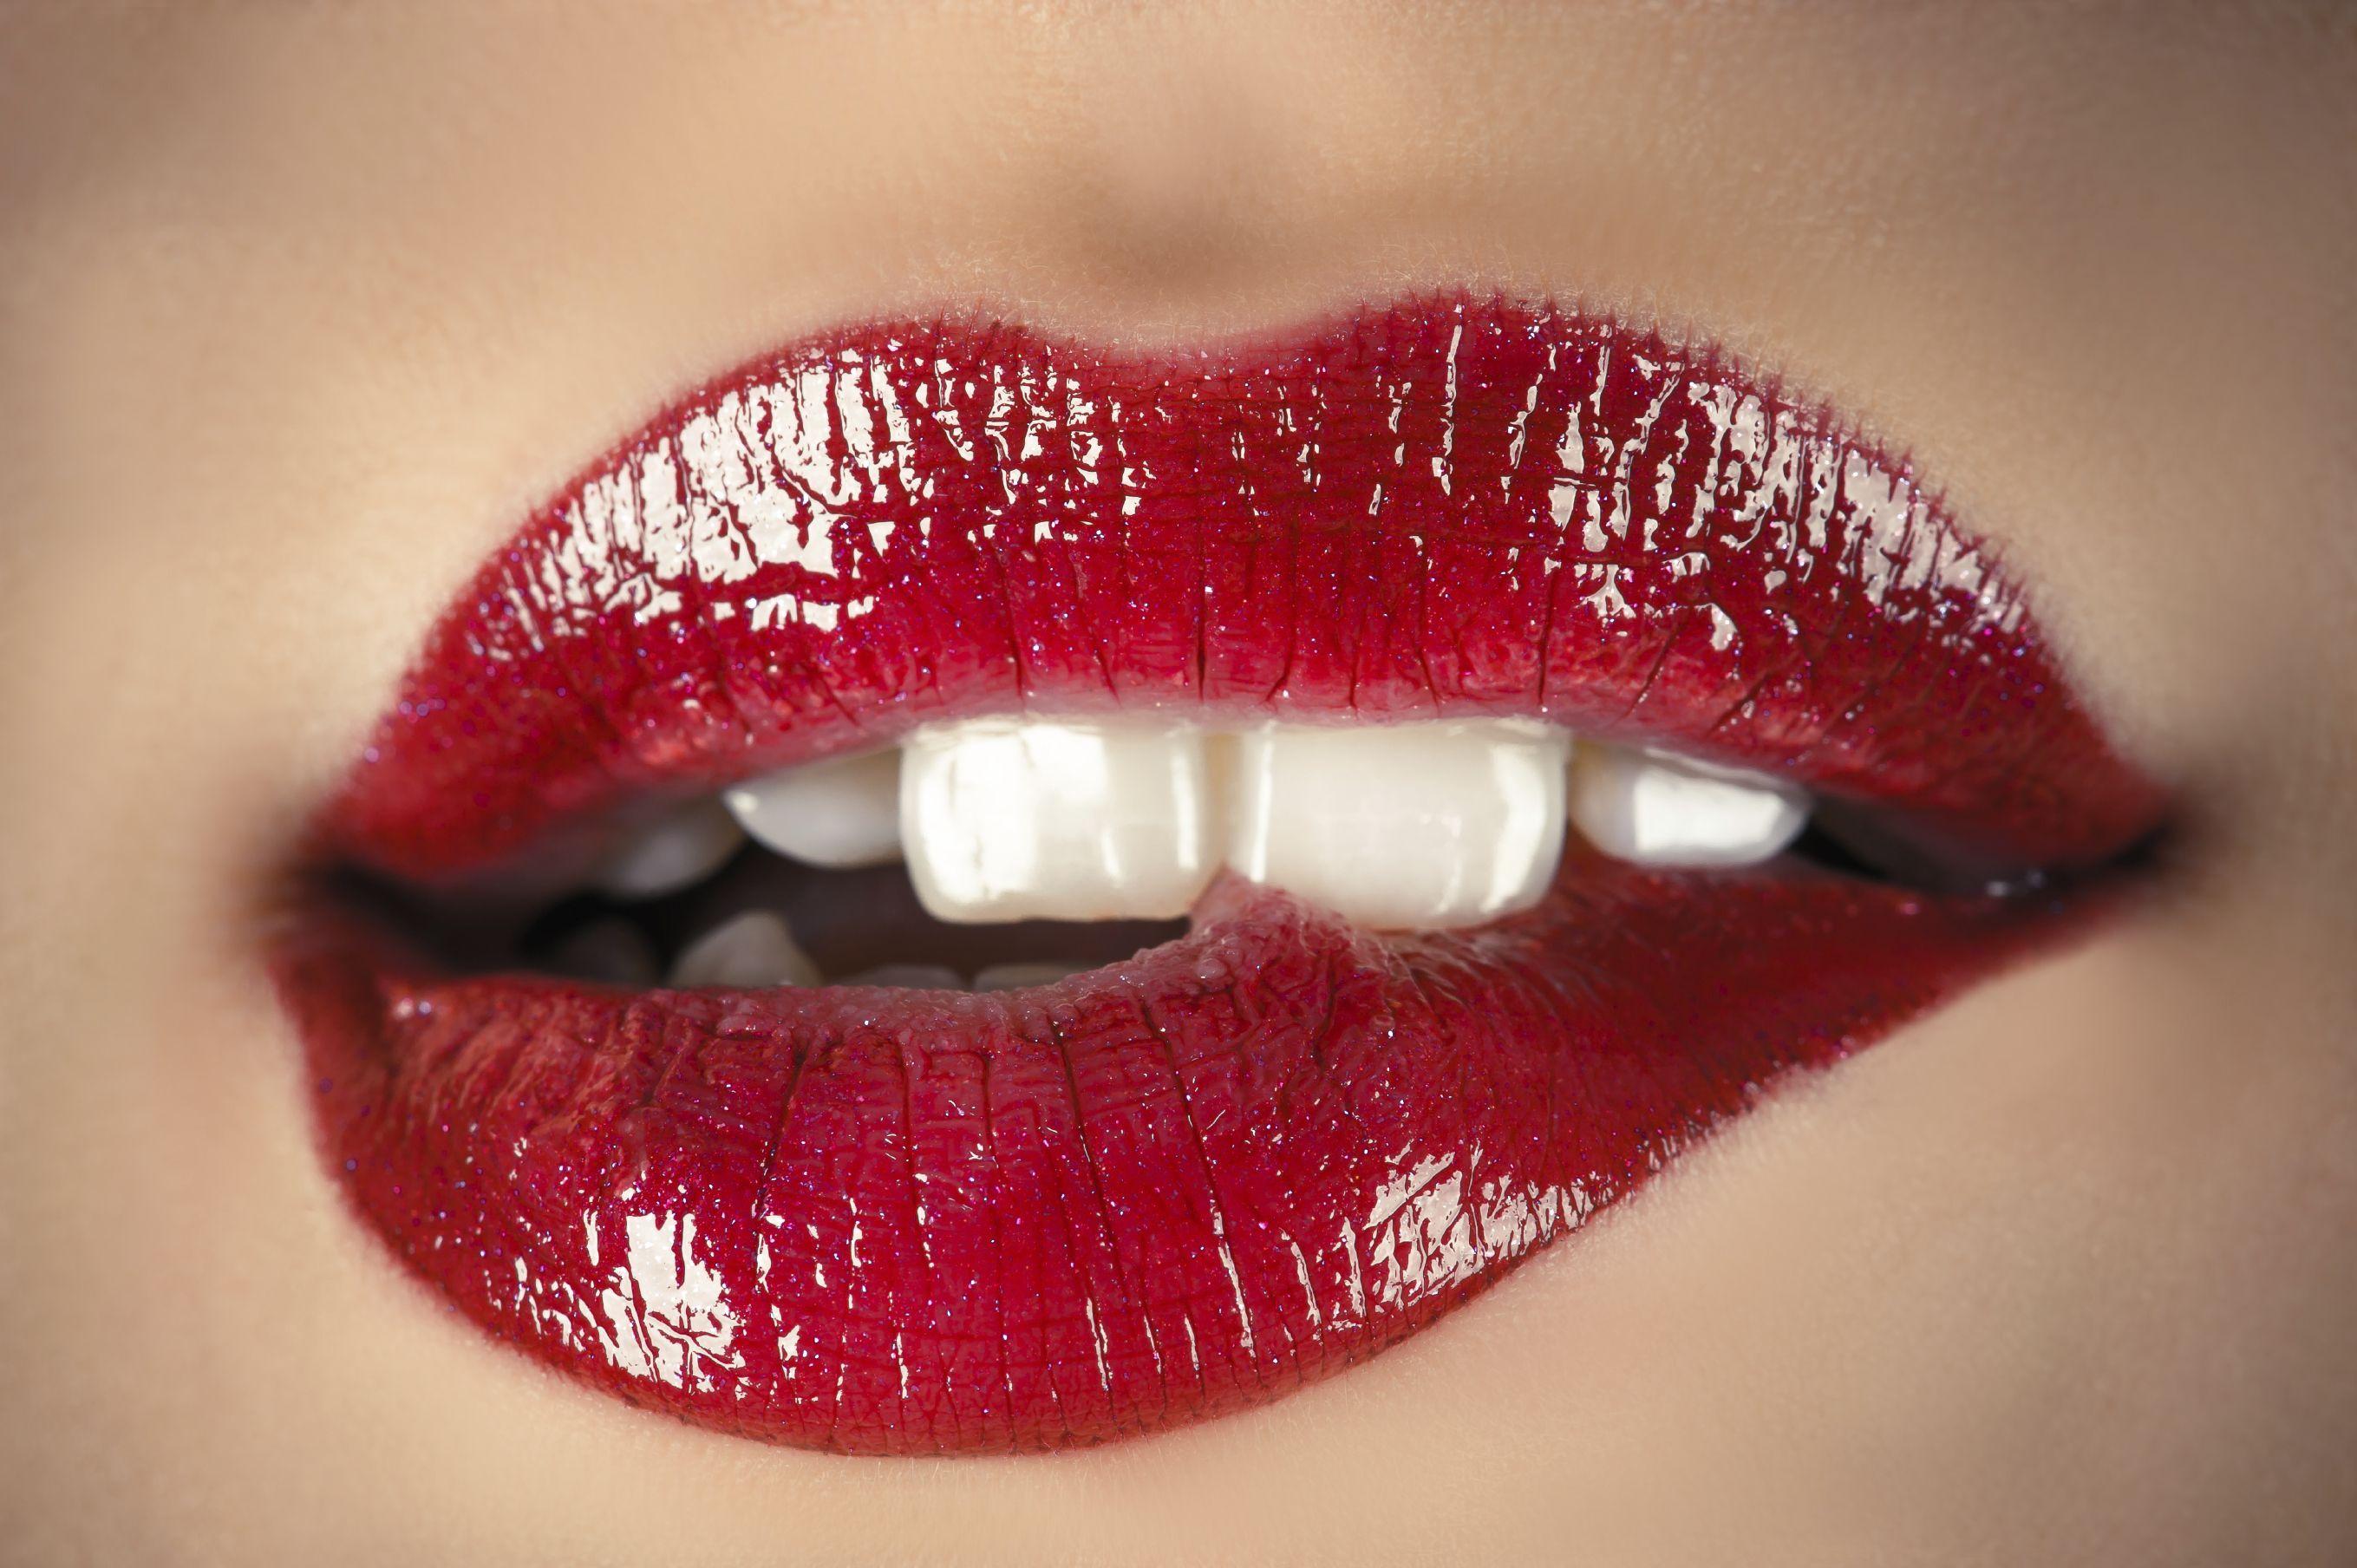 Sexy Lippen Bilder 454 Best Lippen Images In 2018 2019 04 21